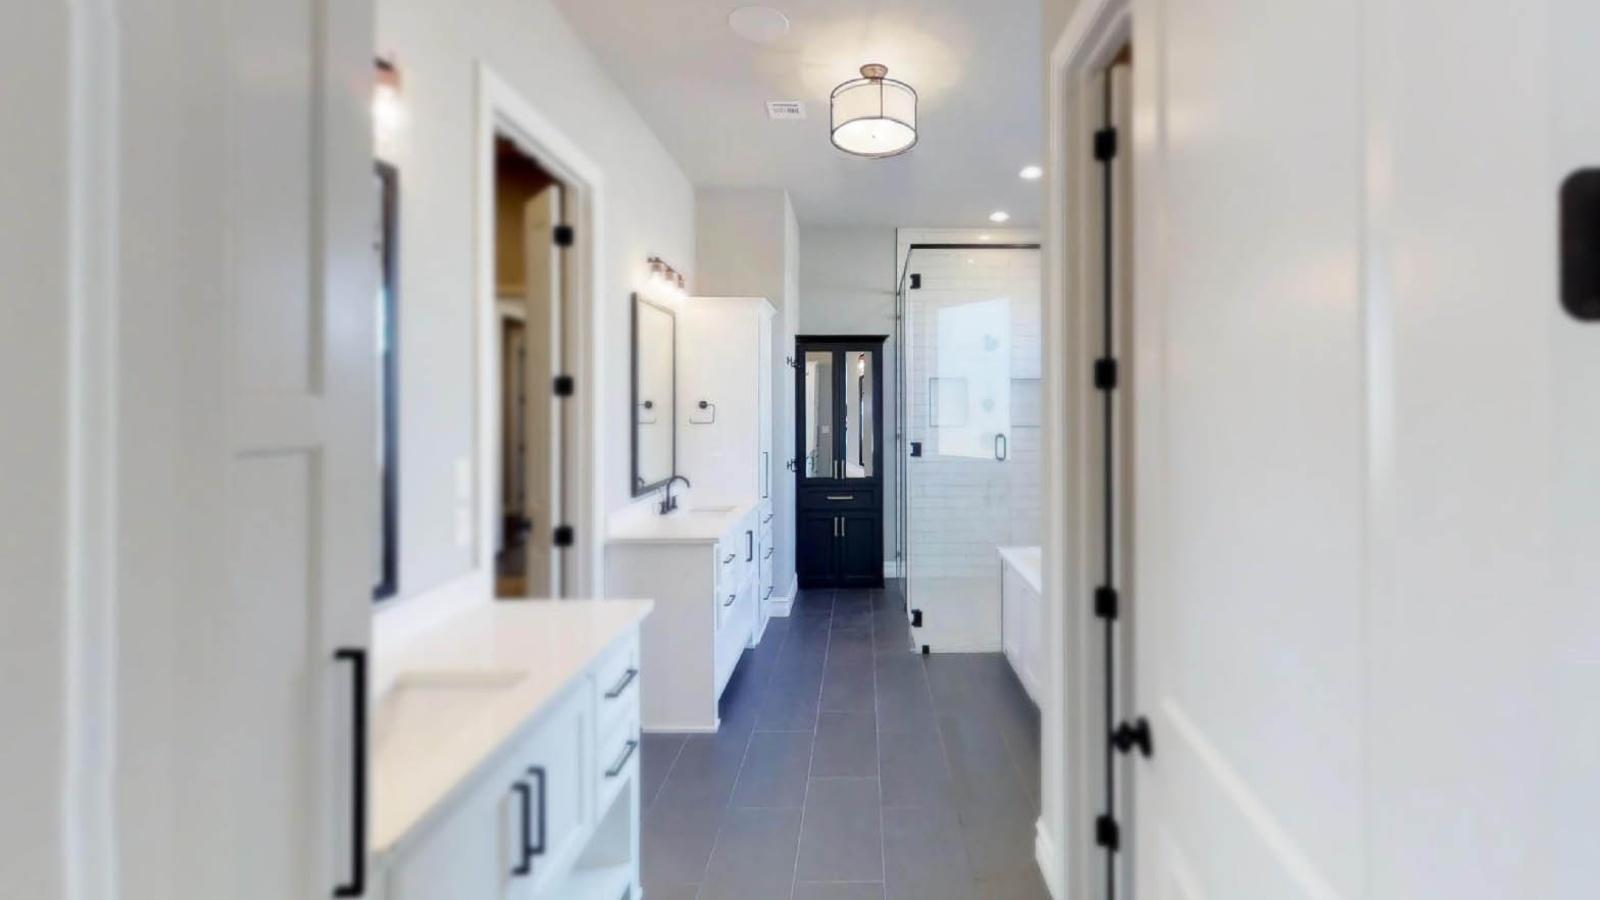 5 Bedrooms Bedrooms, ,6 BathroomsBathrooms,Custom Home,Home Plans,1046